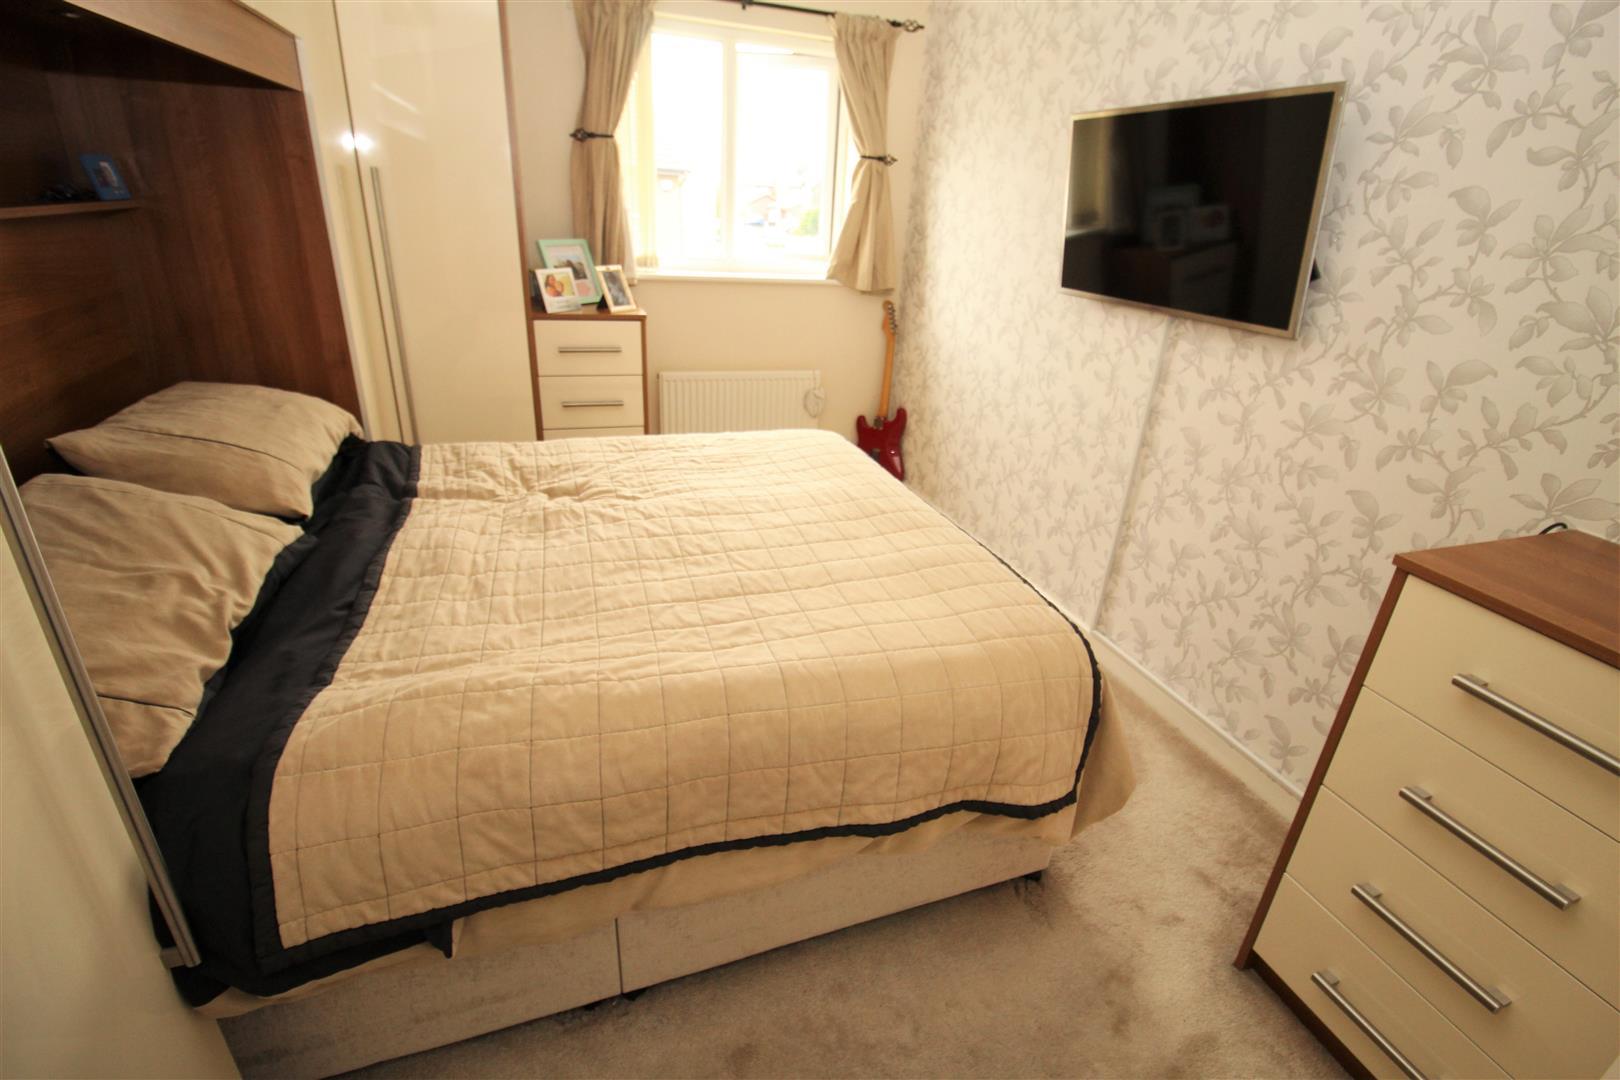 3 Bedrooms, House - Detached, Barlows Lane, Fazakerley, Liverpool